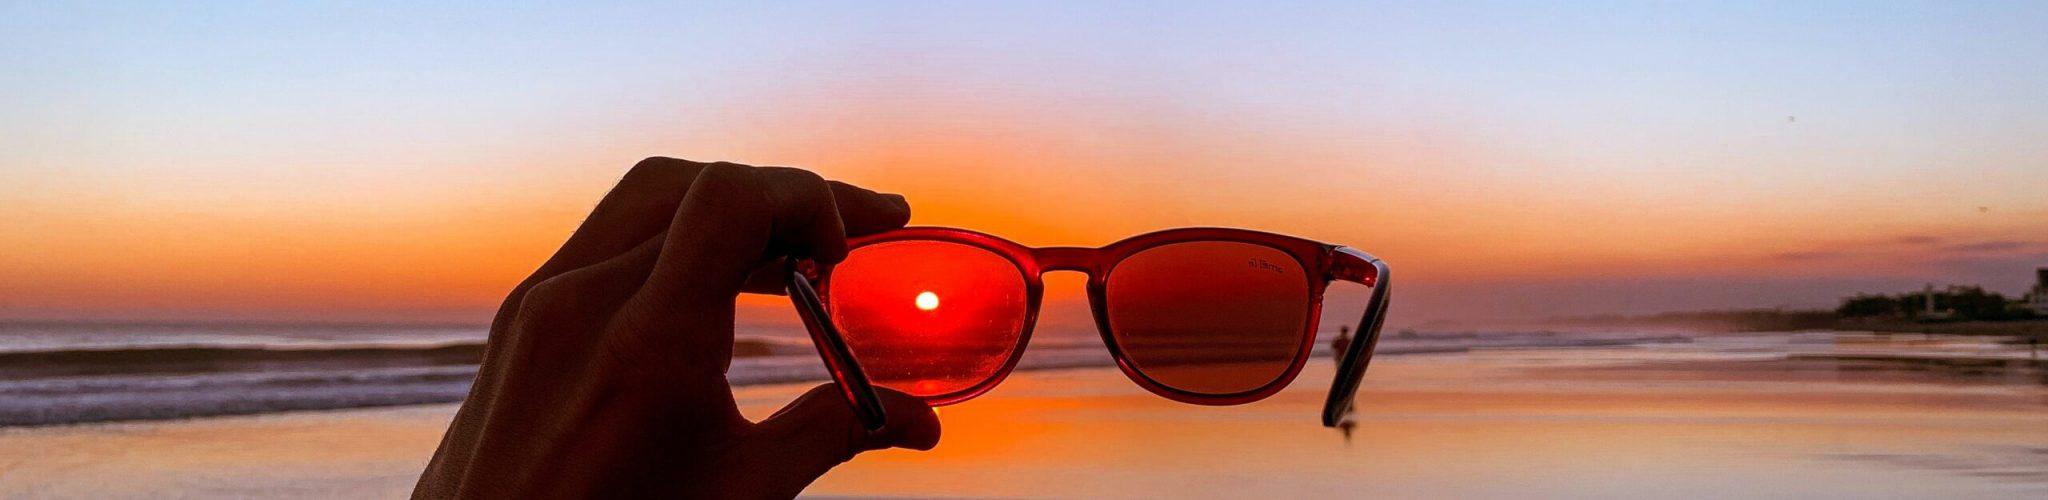 zonnebril Bloemendal optometrie en audiciens